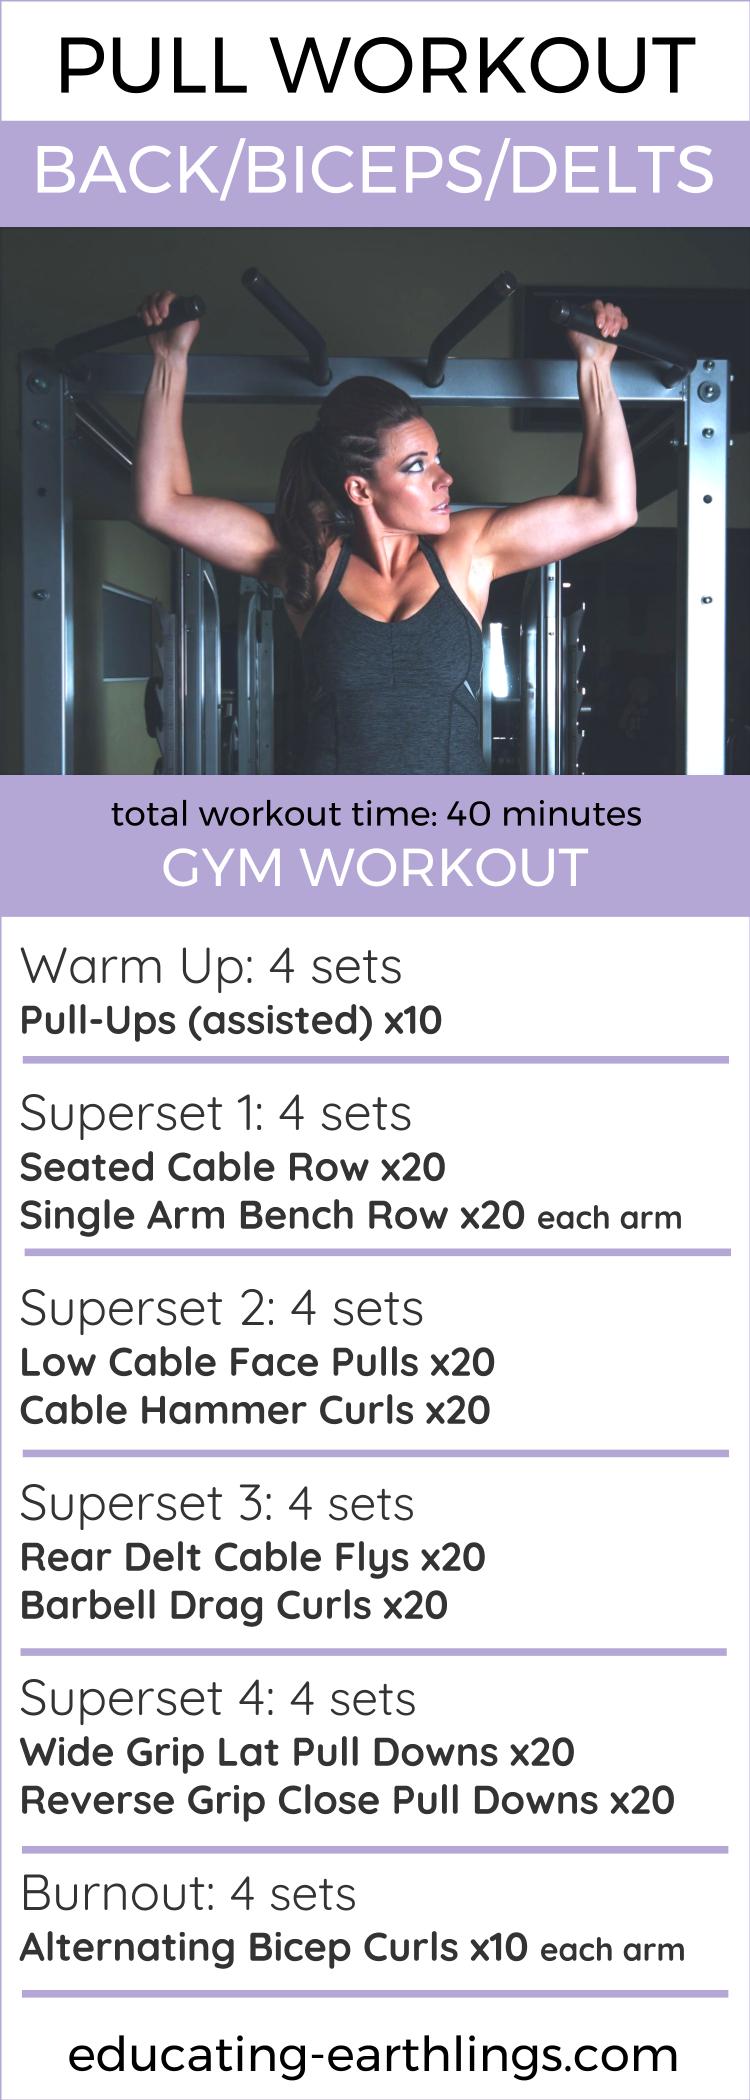 Pull Workout Push Leg Split Work It Out Fitness Legs Killer Circuit Totally Dead Superset Back Bicep Womens Health Coach Online Coaching Vegan Veganism